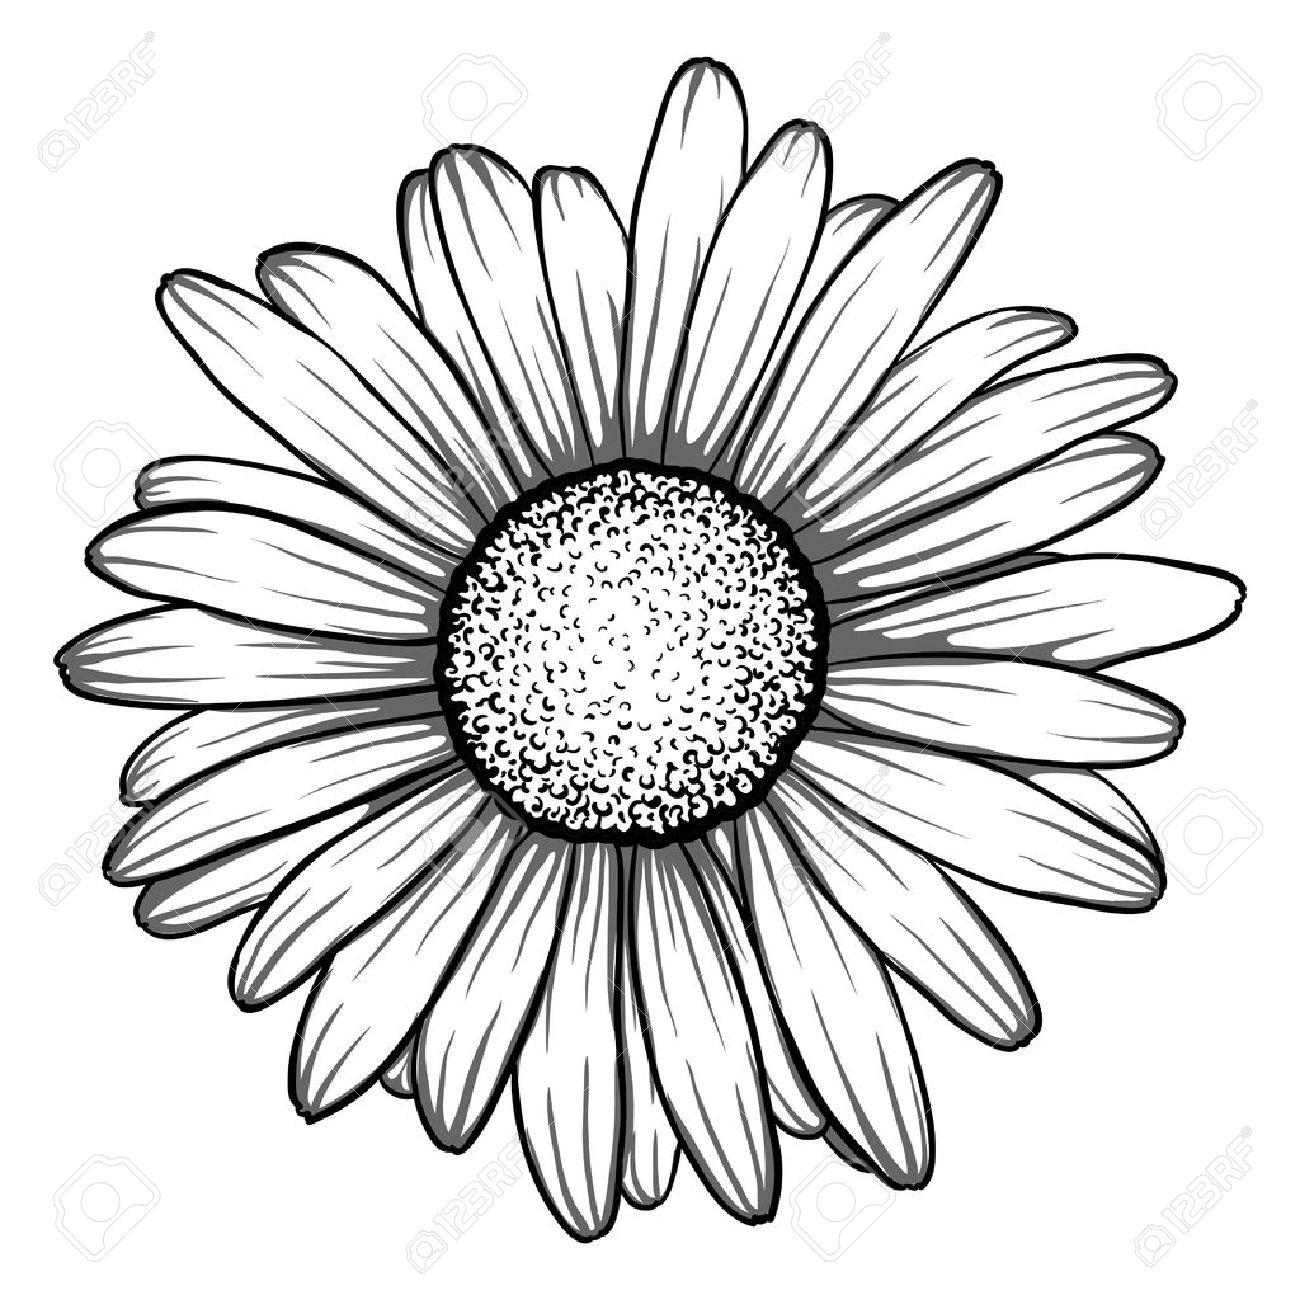 1300x1300 Daisy Flower Outline